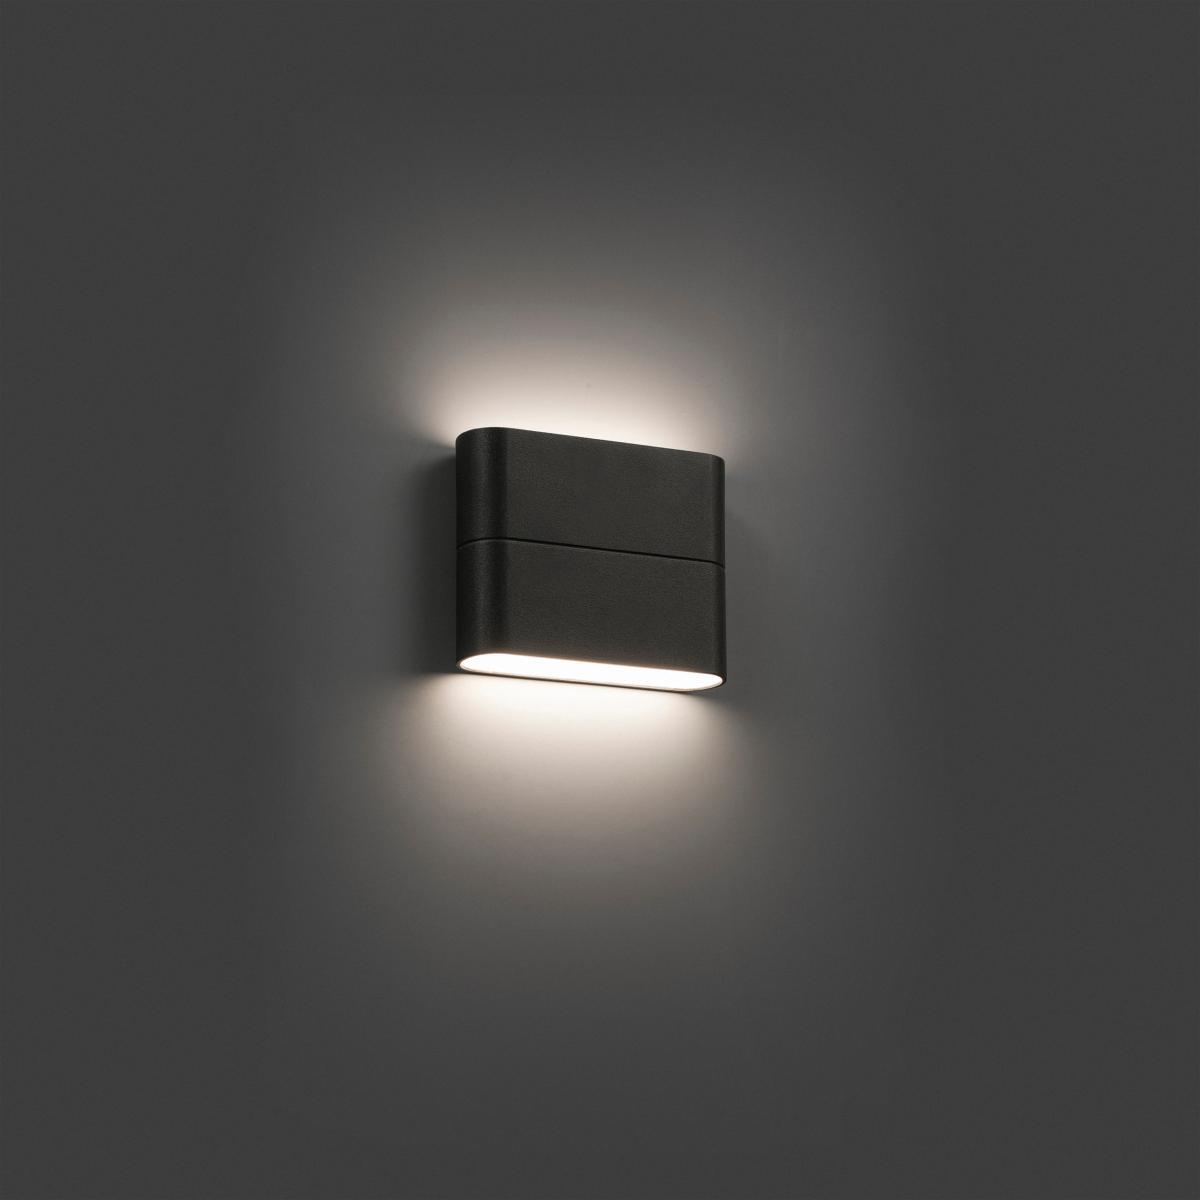 applique murale ext rieure aday faro ip54 70645. Black Bedroom Furniture Sets. Home Design Ideas